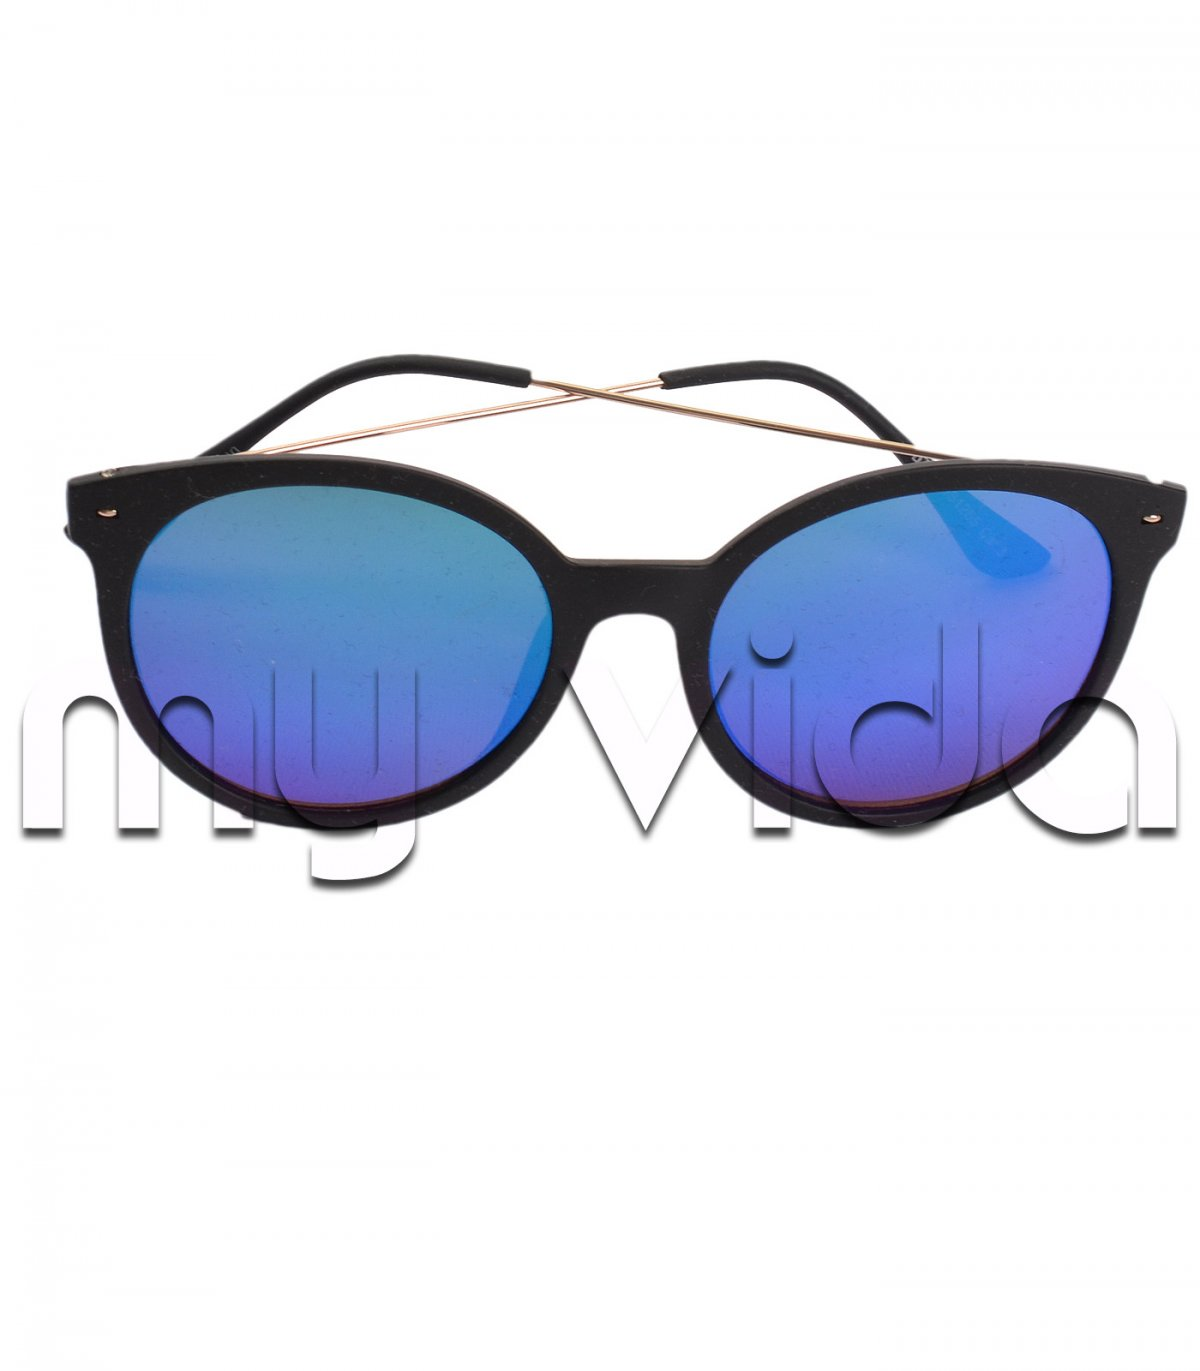 Occhiali donna lenti blu my vida - Occhiali specchio blu ...